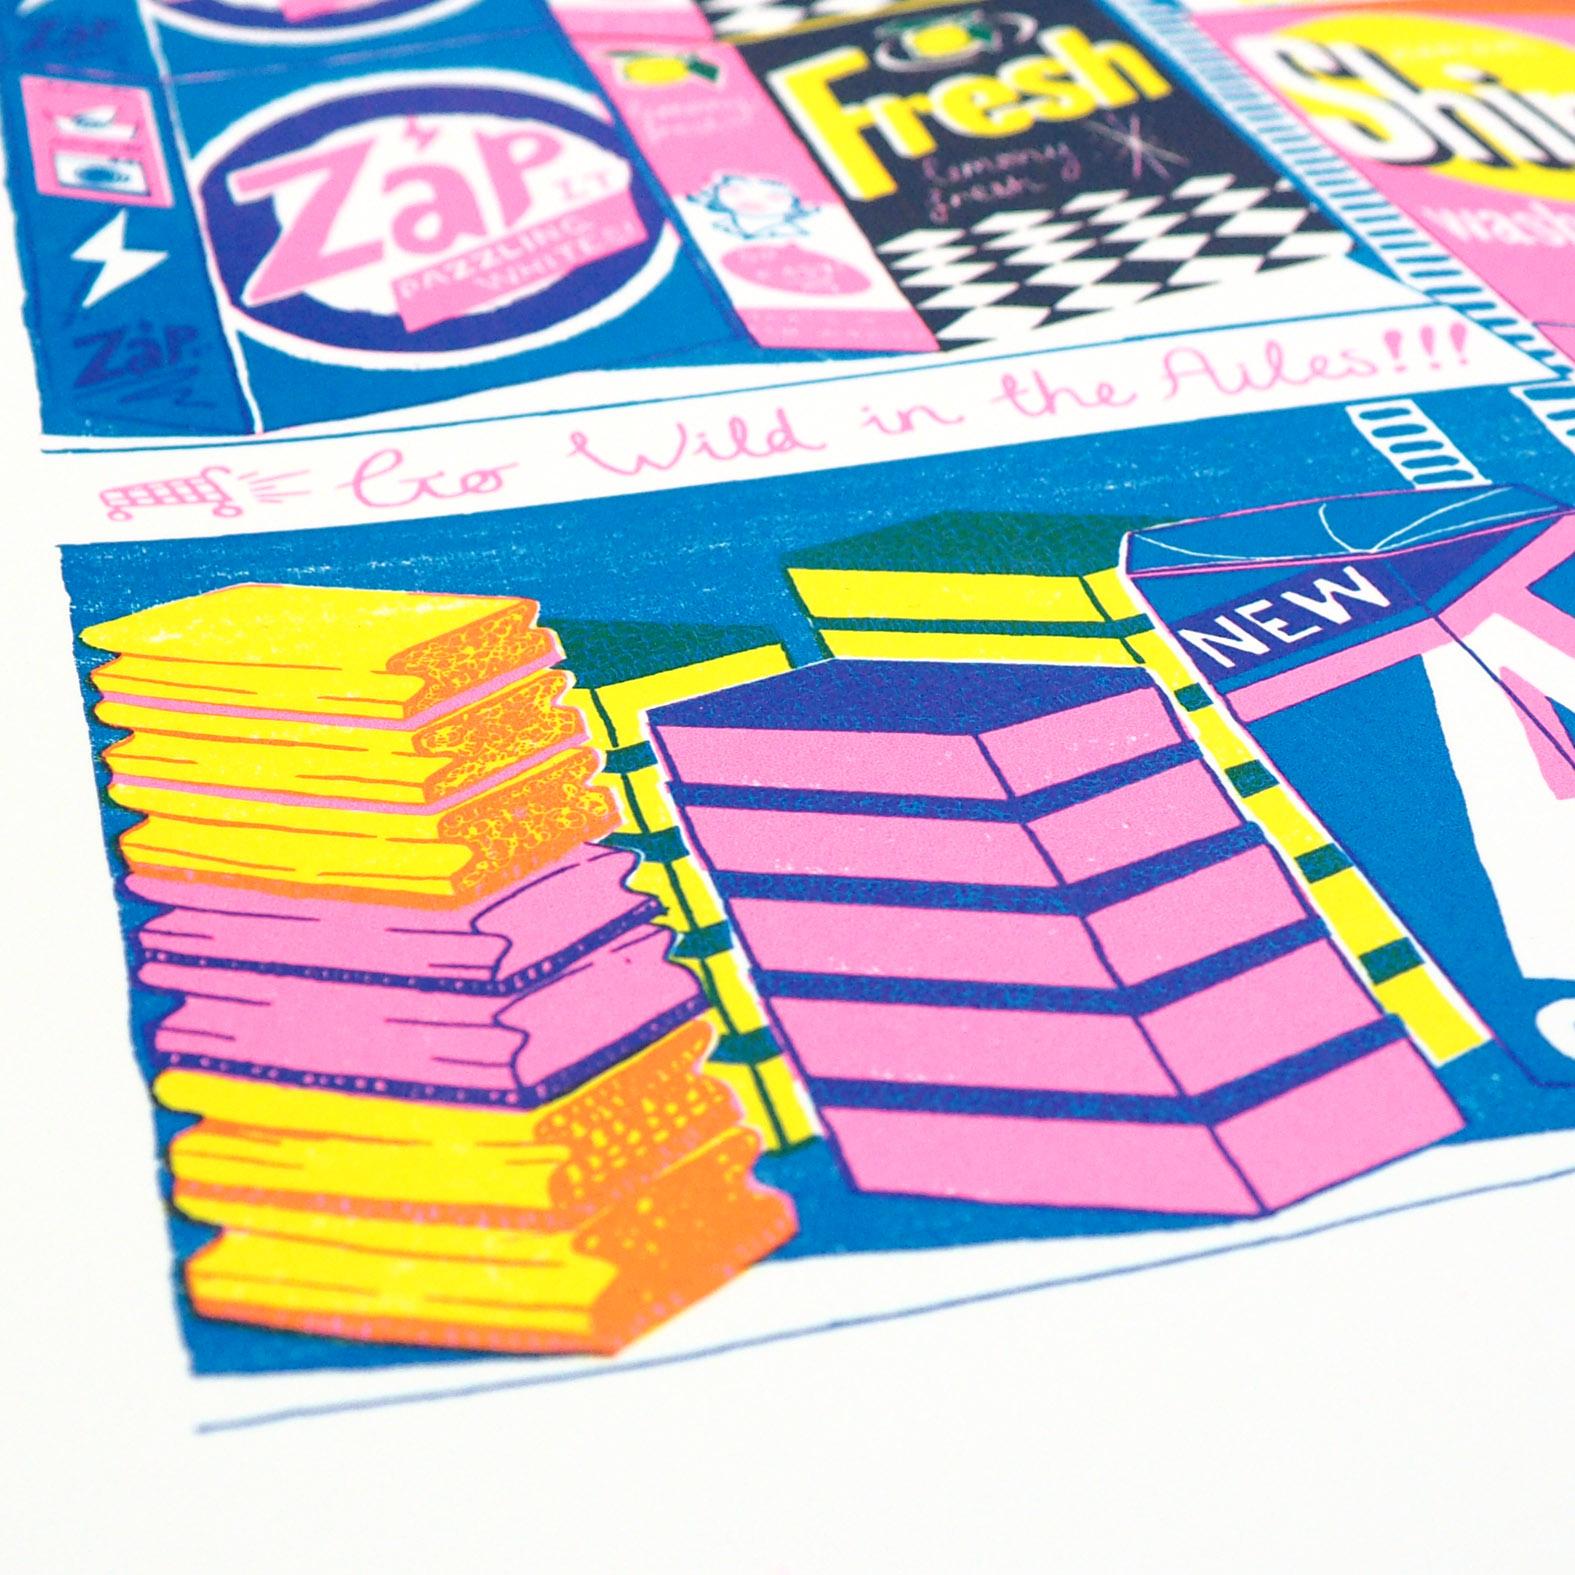 Blisters-Print-Supermarket-Sweep-3sm.jpg